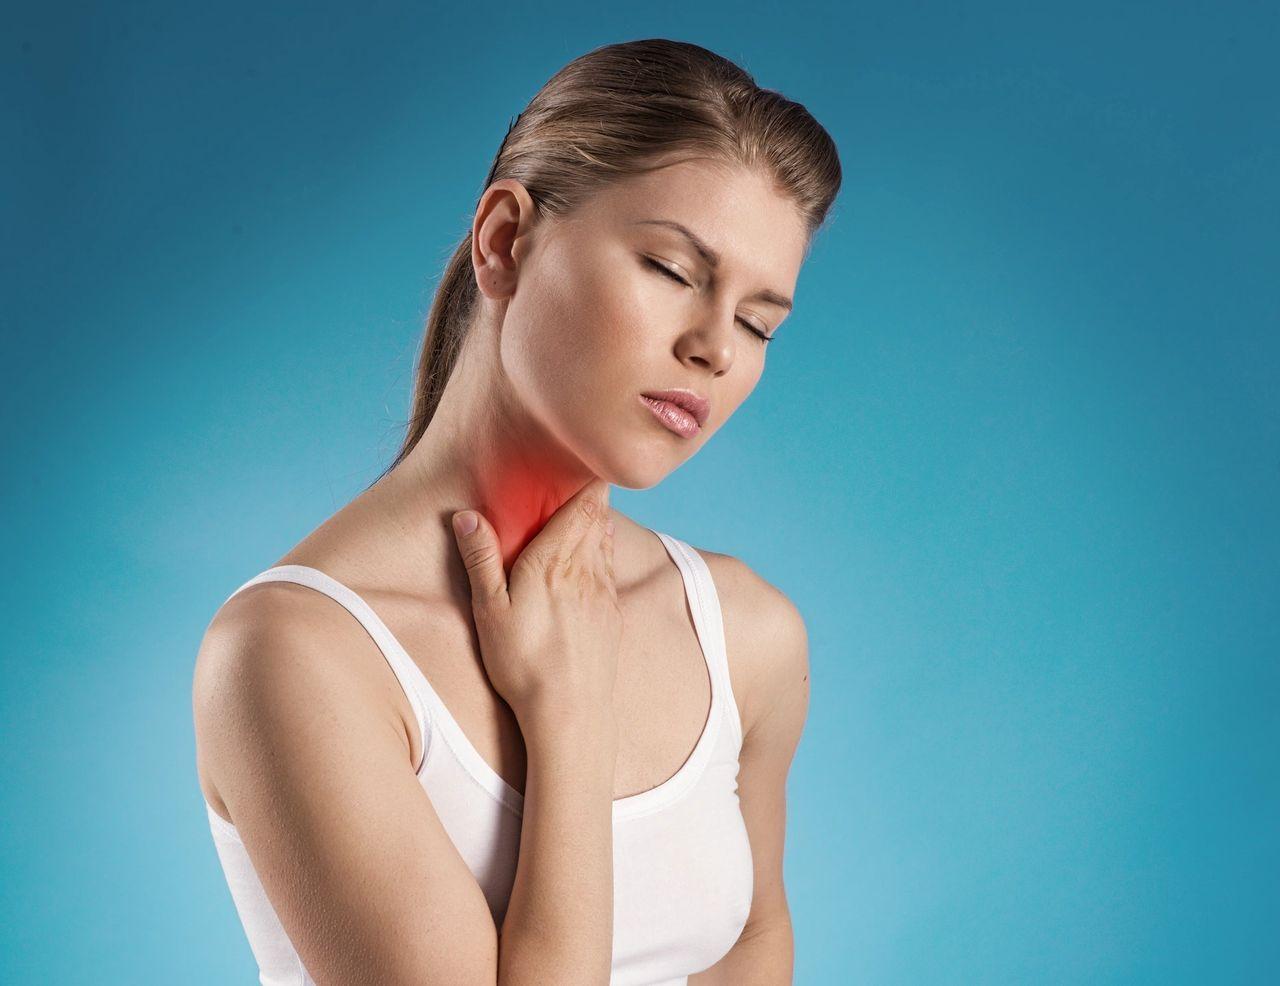 Sore Throat   Telehealth Medicine   Telehealth and Biohacking solutions   Kiya Longevity